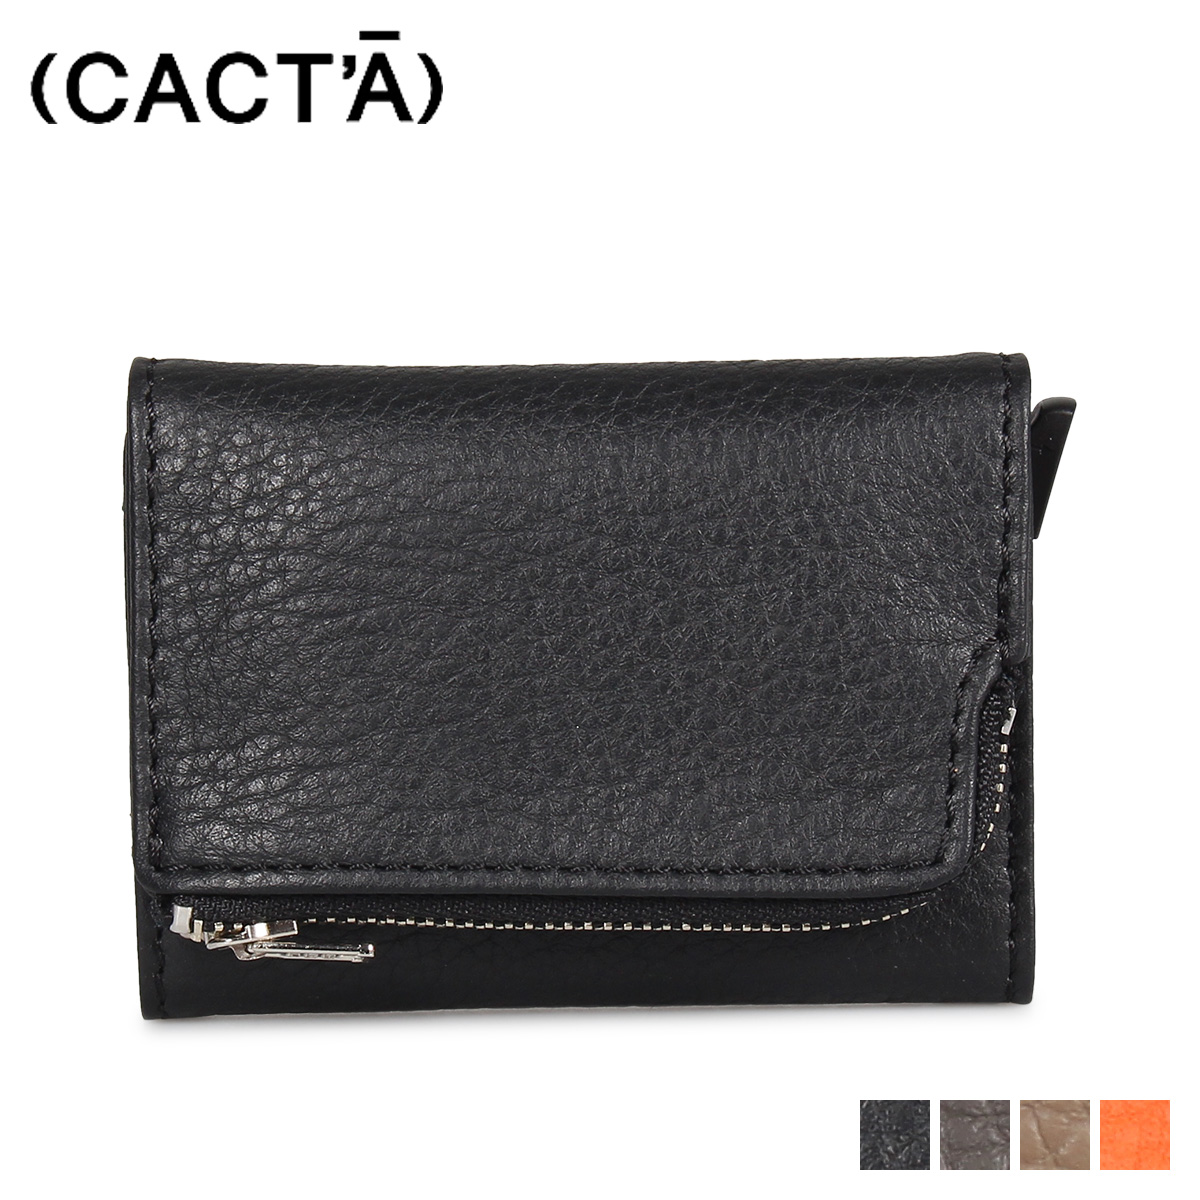 CACTA PAYMENT HUNTER WALLET REMY カクタ 財布 ミニ財布 三つ折り メンズ レディース 本革 ブラック グレー ブラウン オンレジ 黒 2004